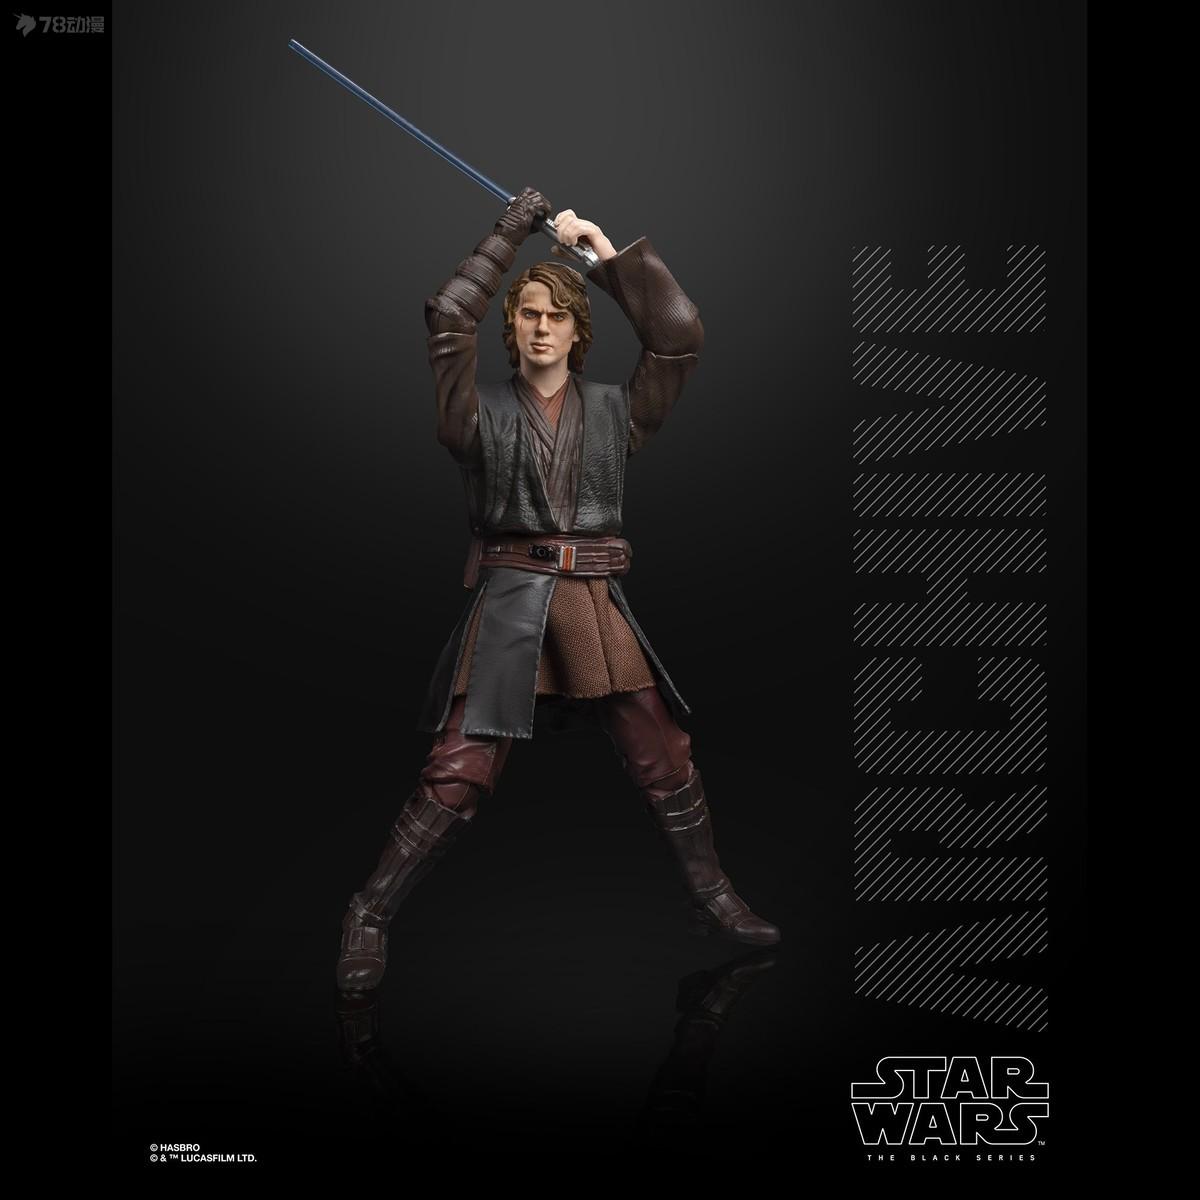 SW_E5_Archive_Anakin_2_2000x.jpg